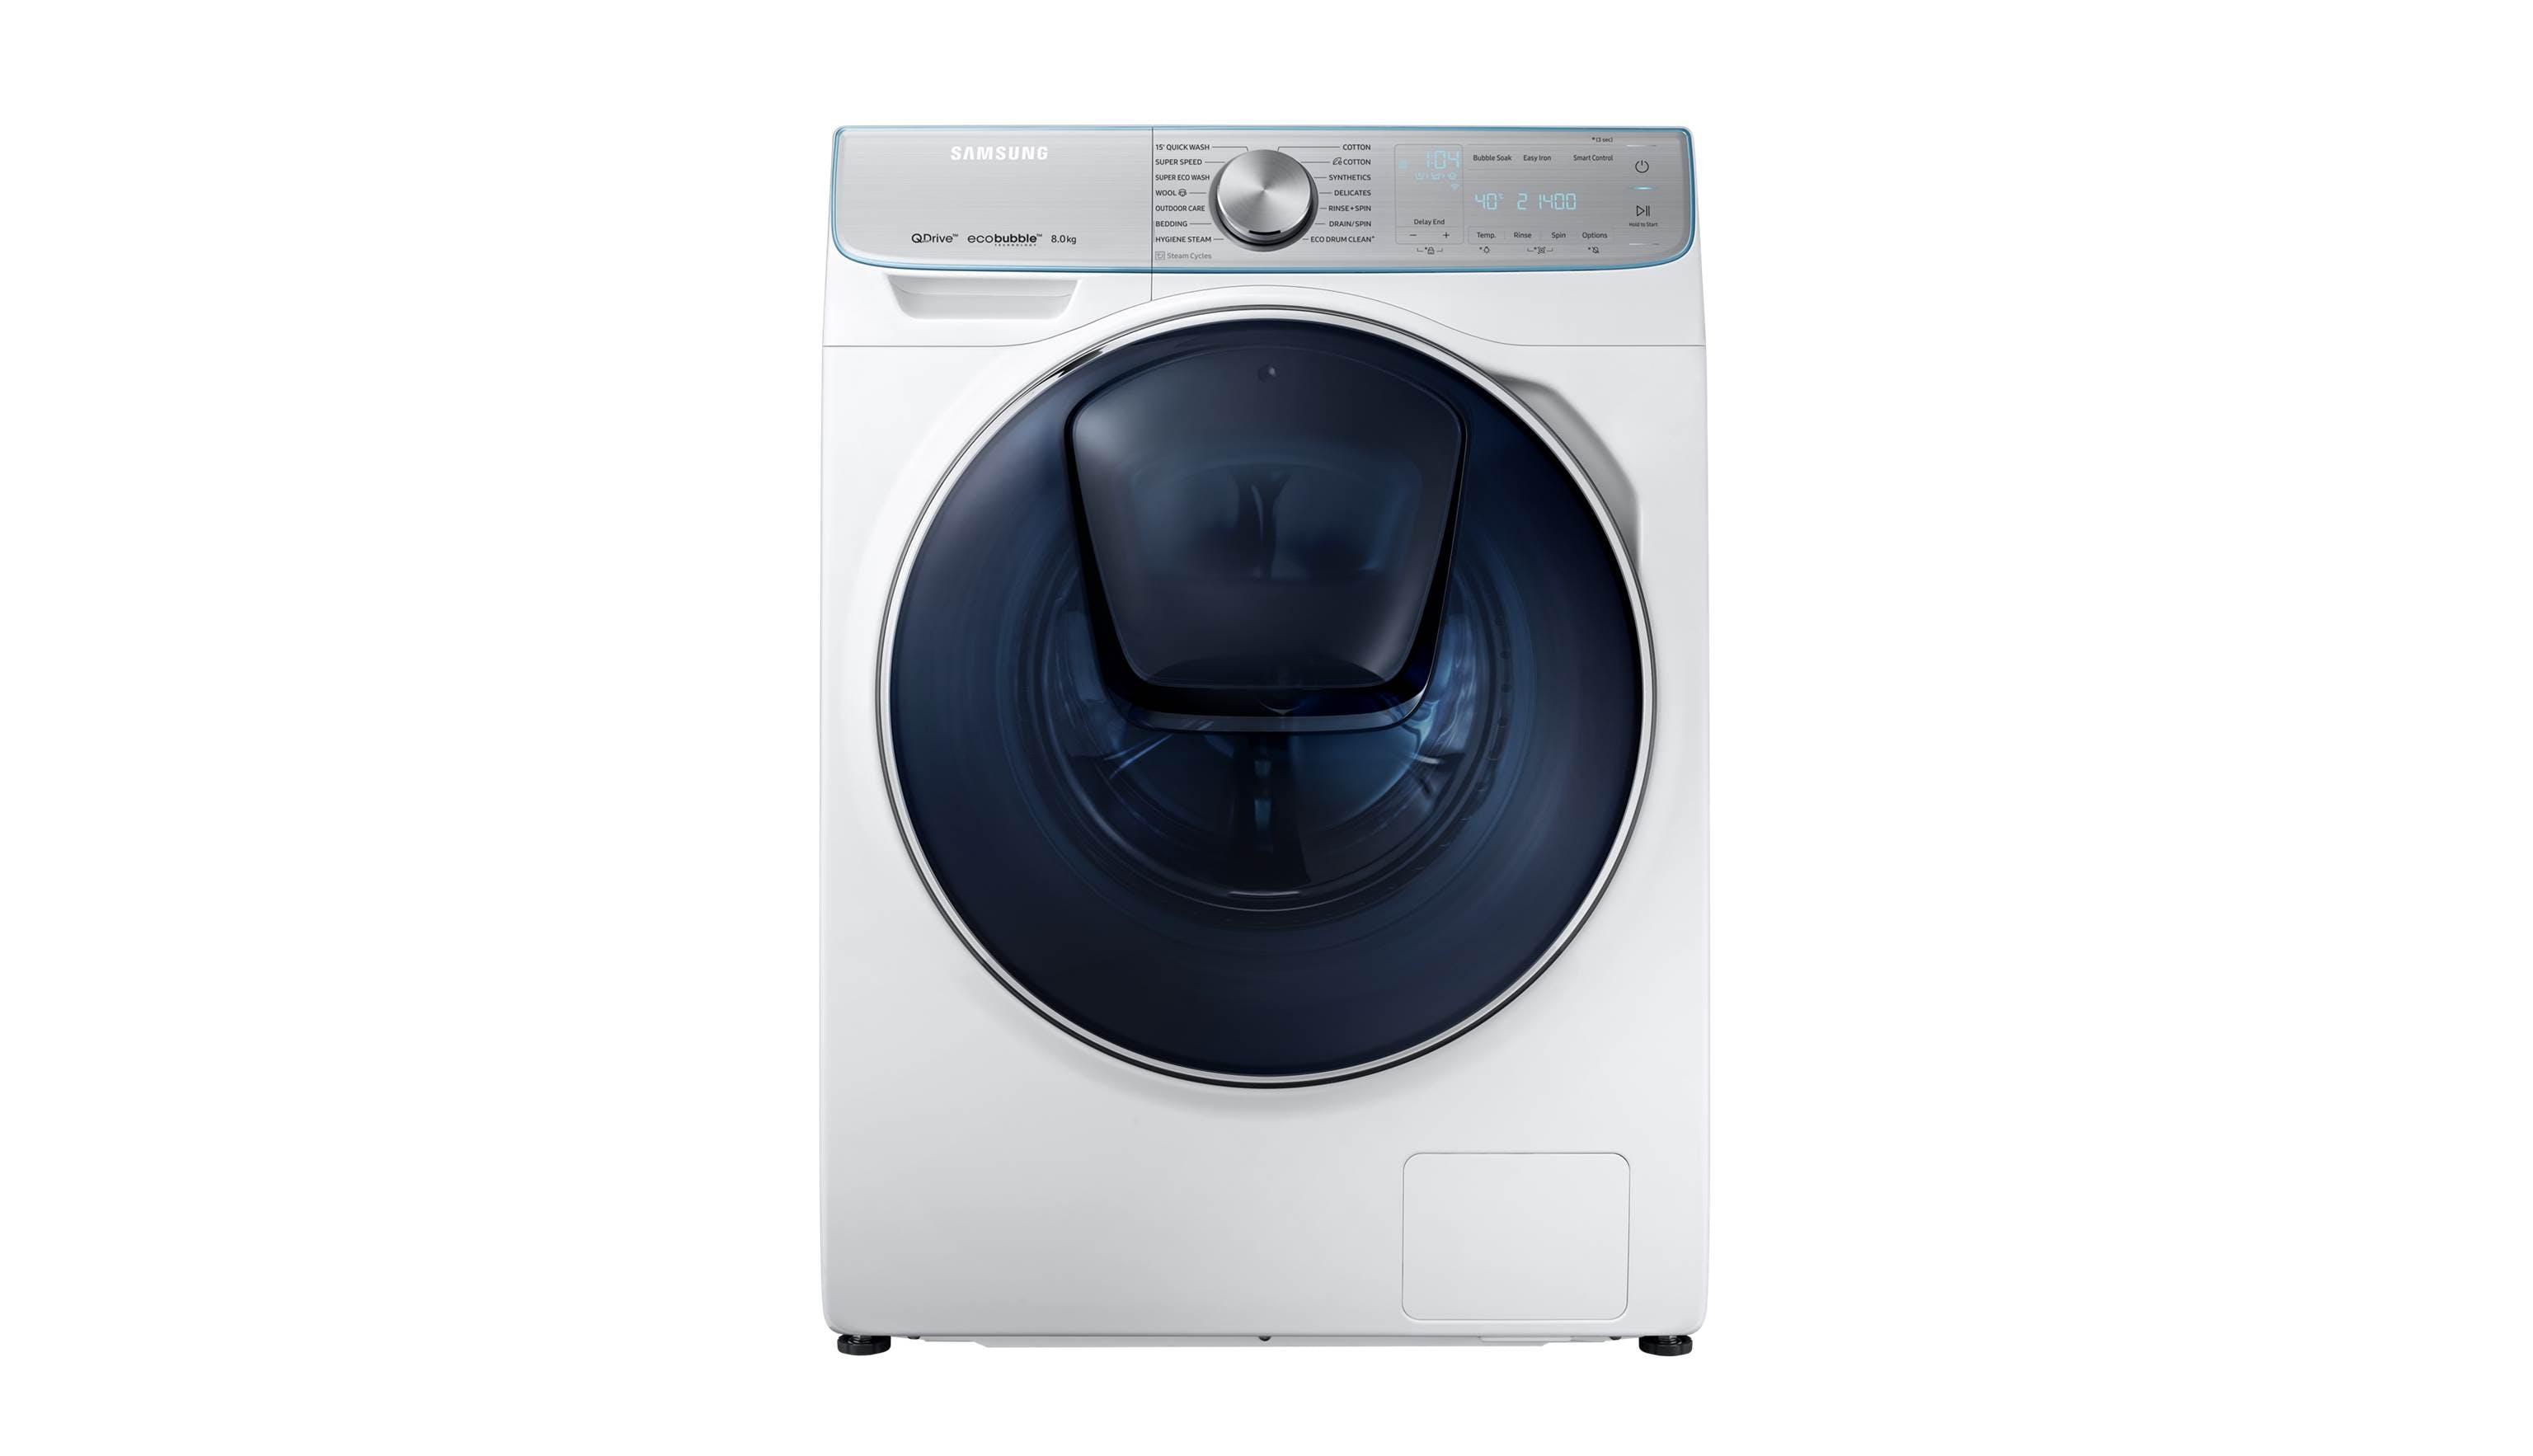 Samsung Ww90m74fnor Sp 9kg Front Load Washing Machine White